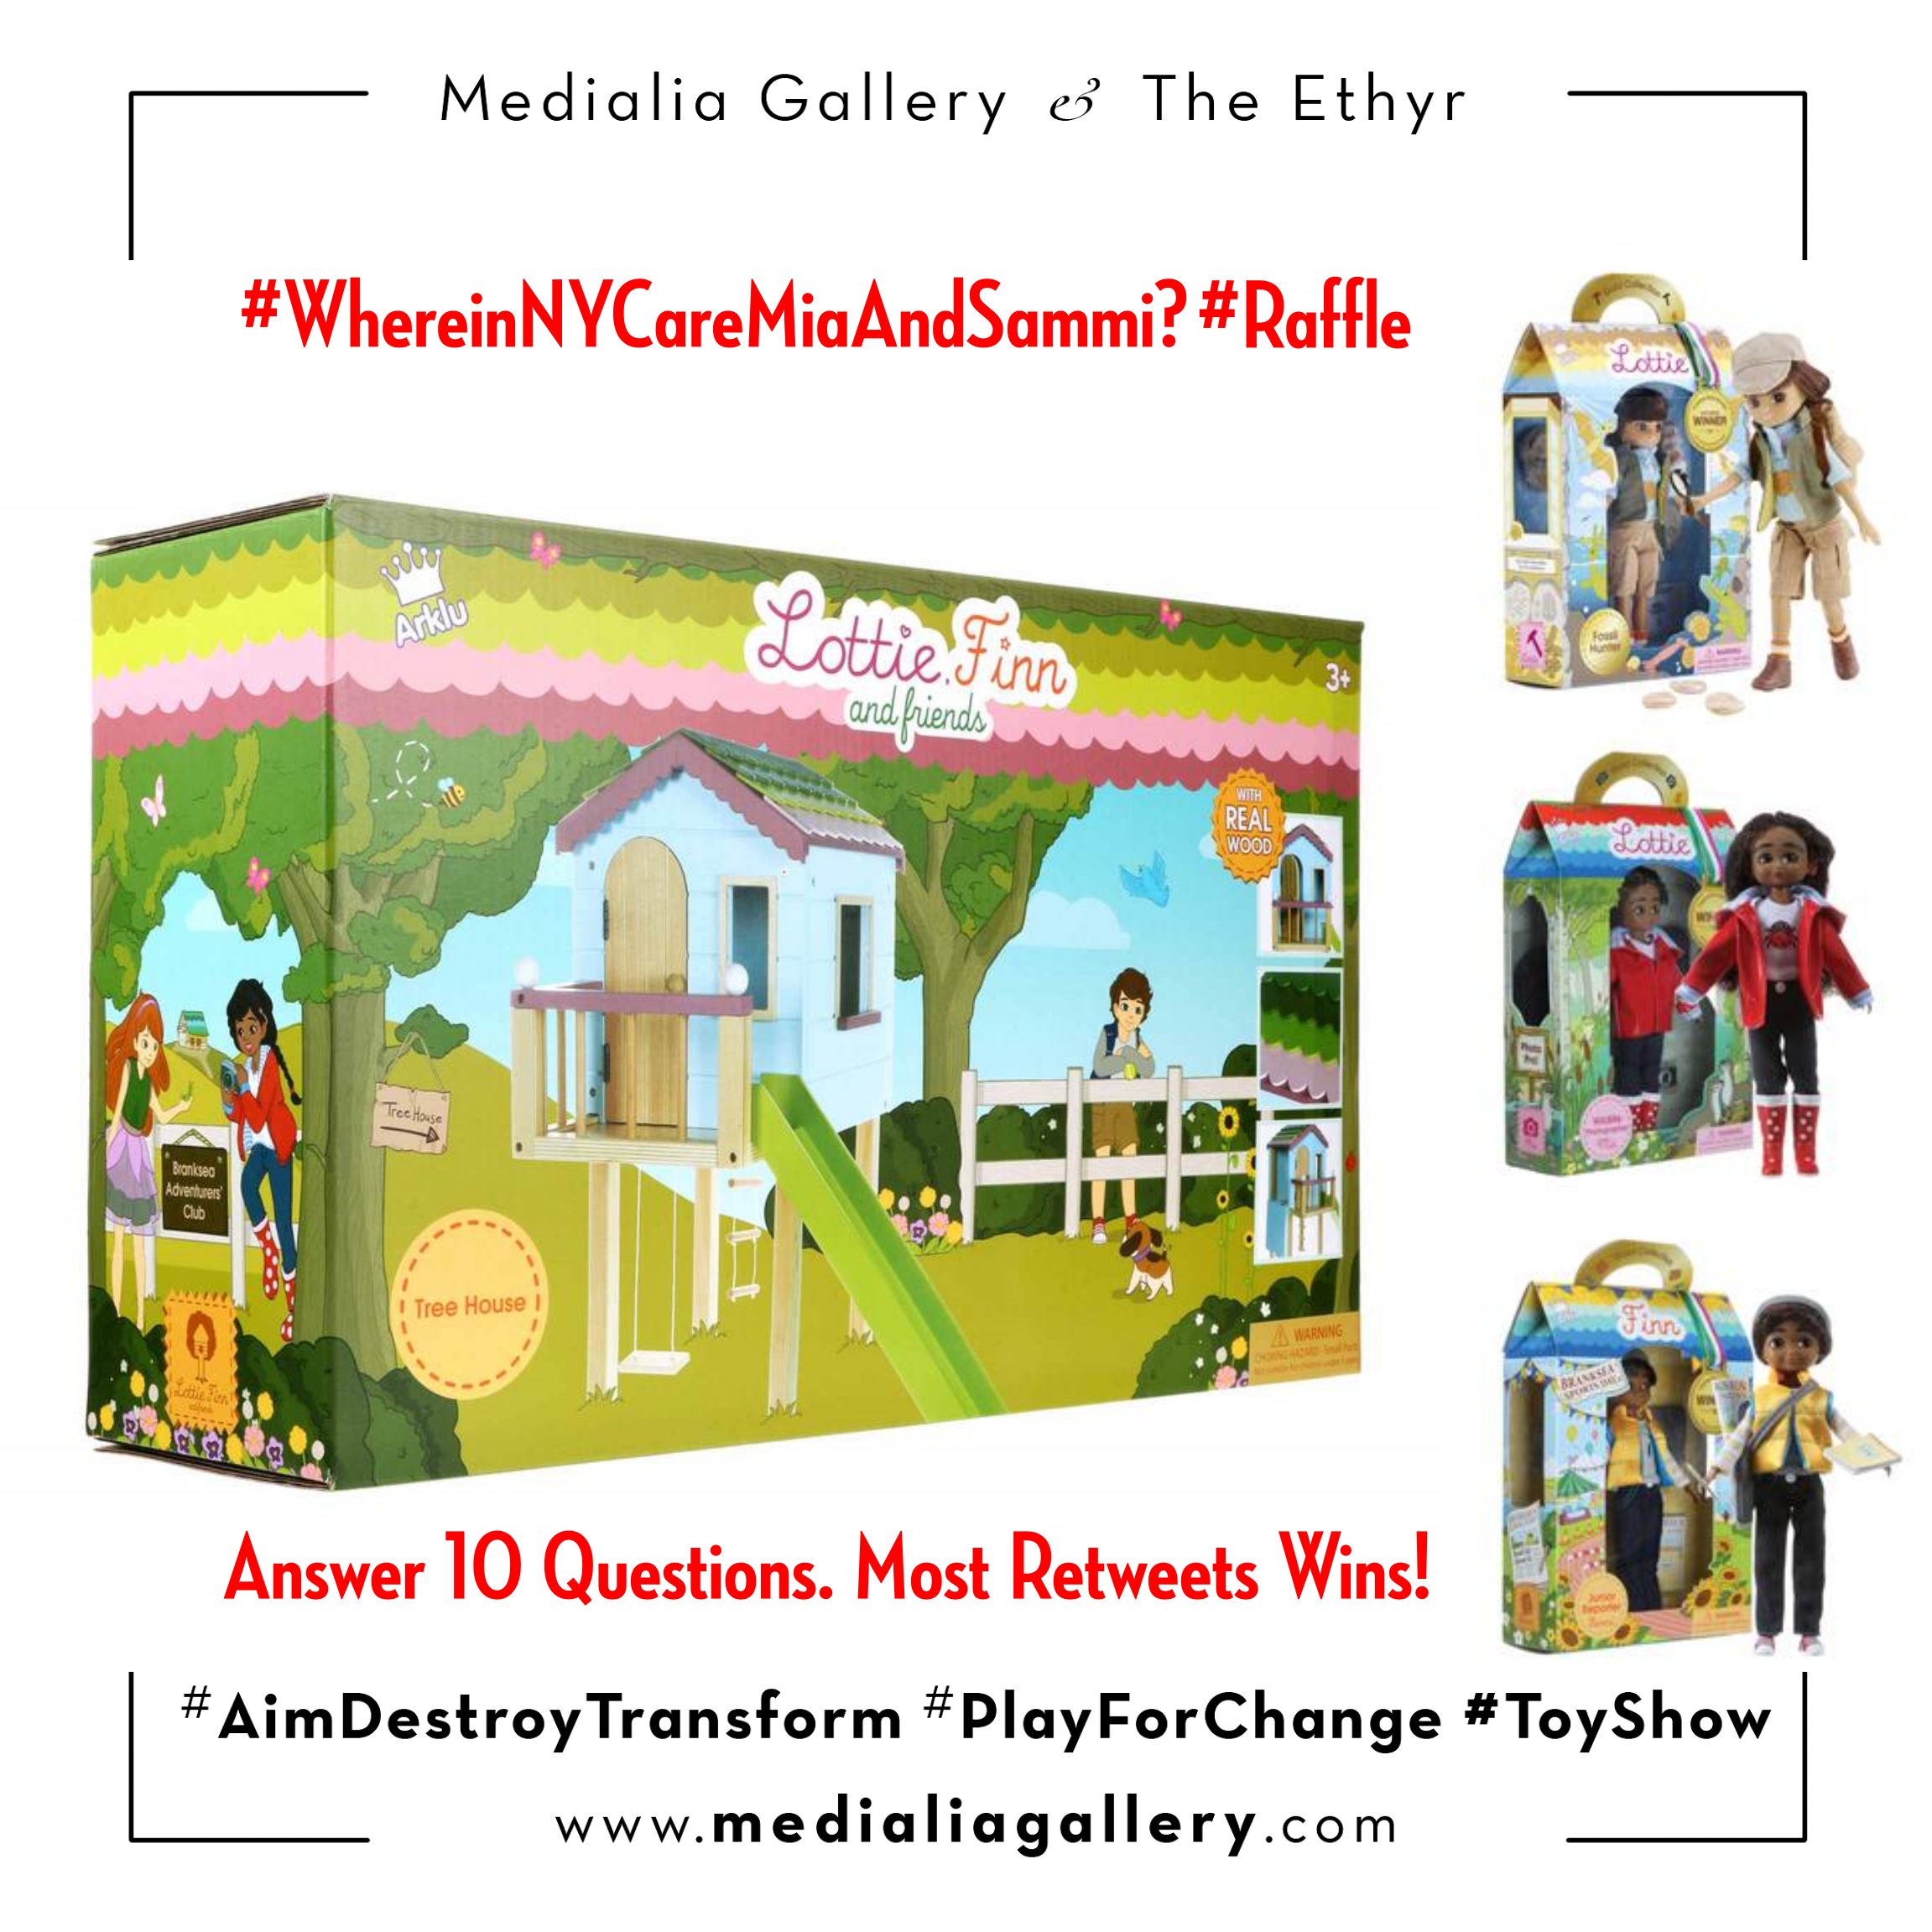 WhereinNYCareMiaAndSammi_Lottie_Dolls_Medialia_The_Ethyr_ToyShow_Rules.png